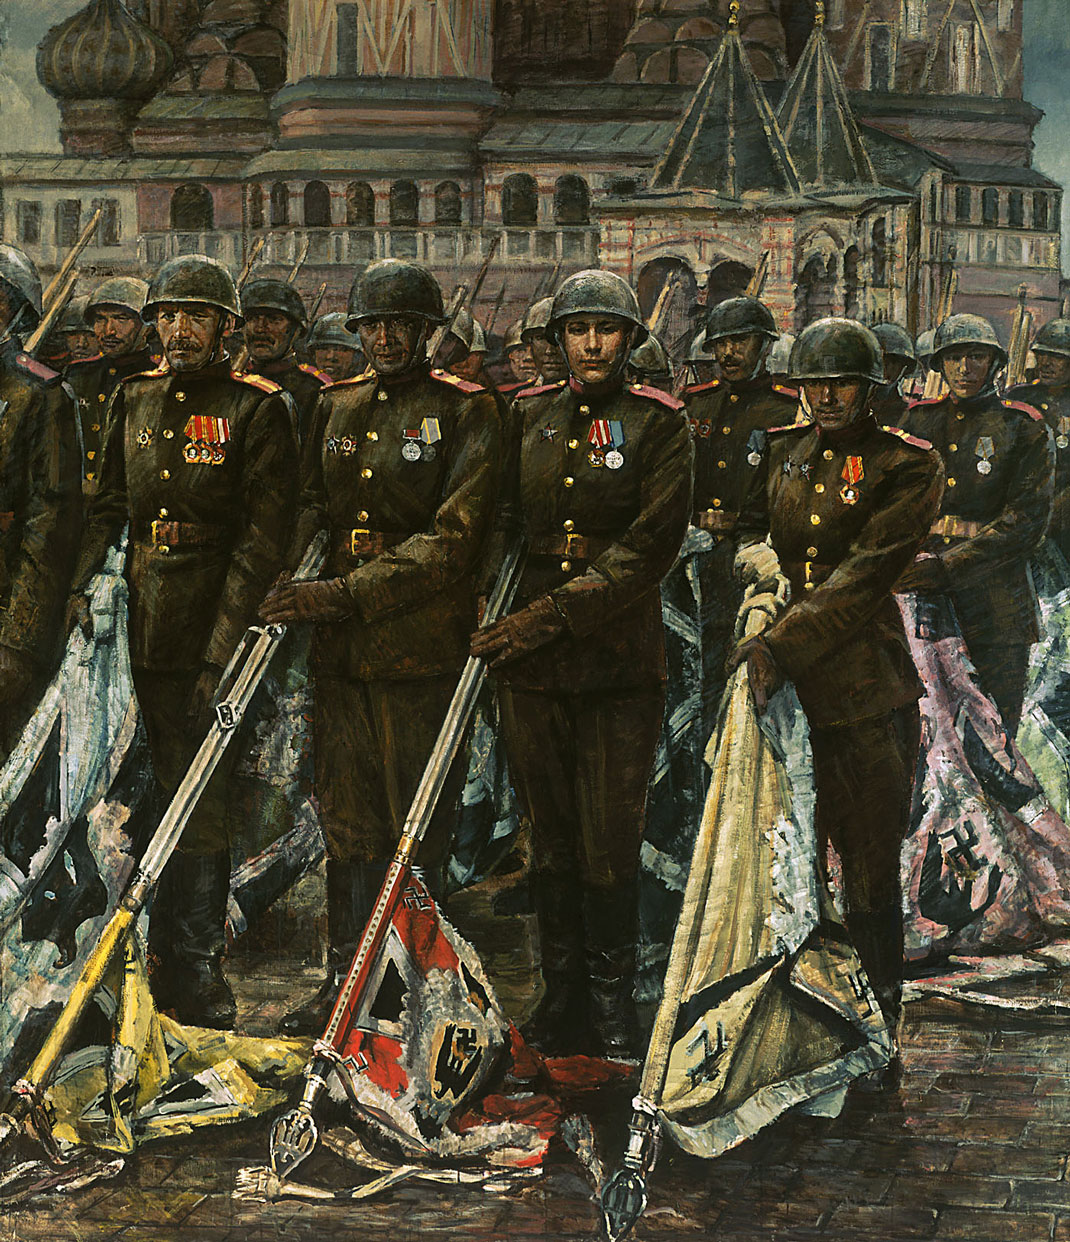 peintures-seconde-guerre-mondiale-45